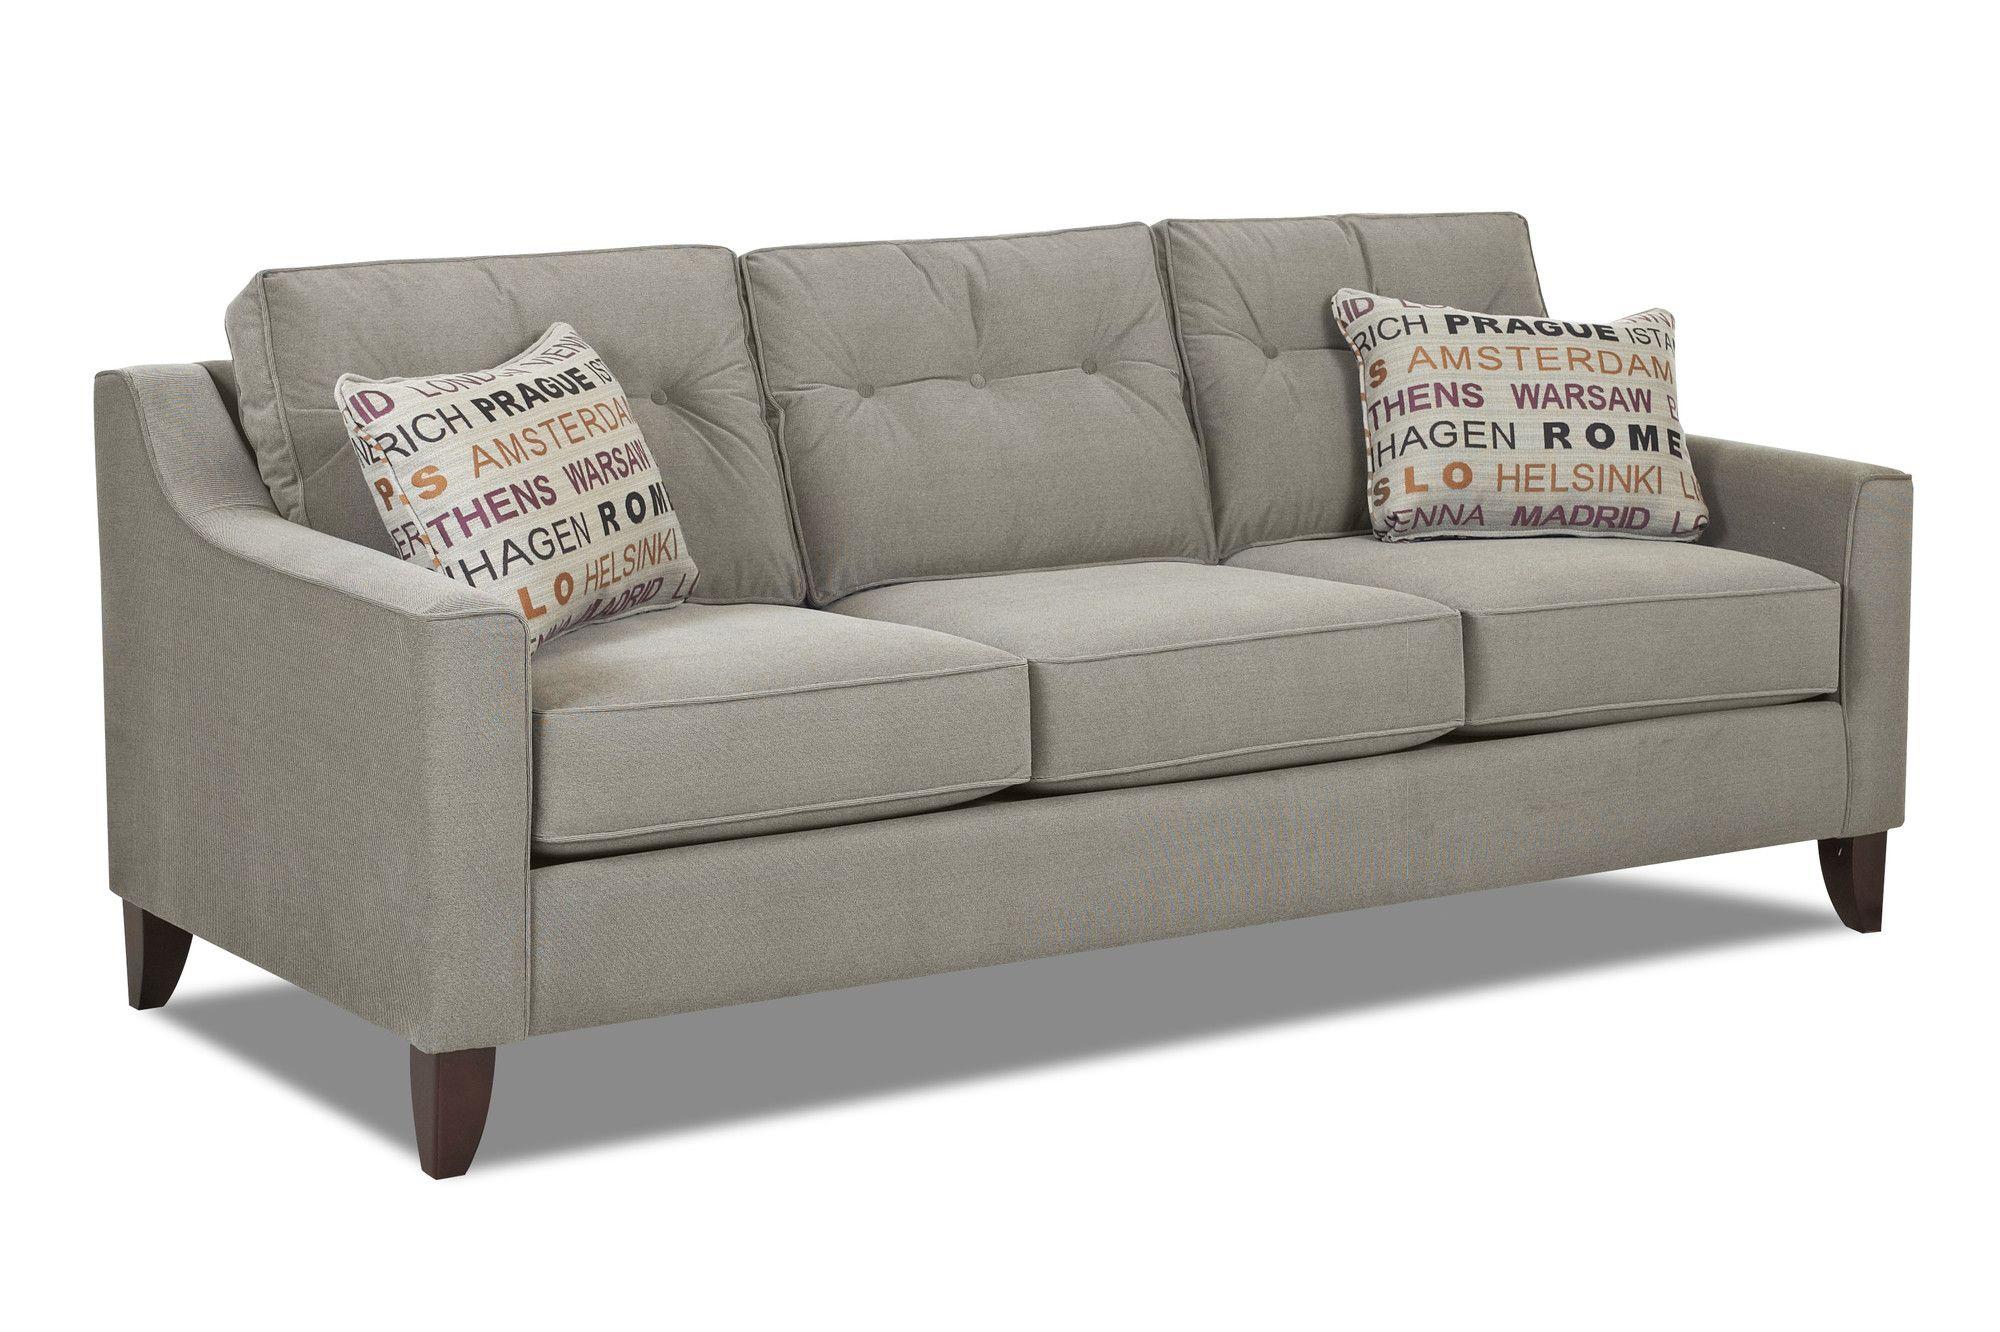 Gentil Klaussner Furniture Audrina Sofa U0026 Reviews | Wayfair